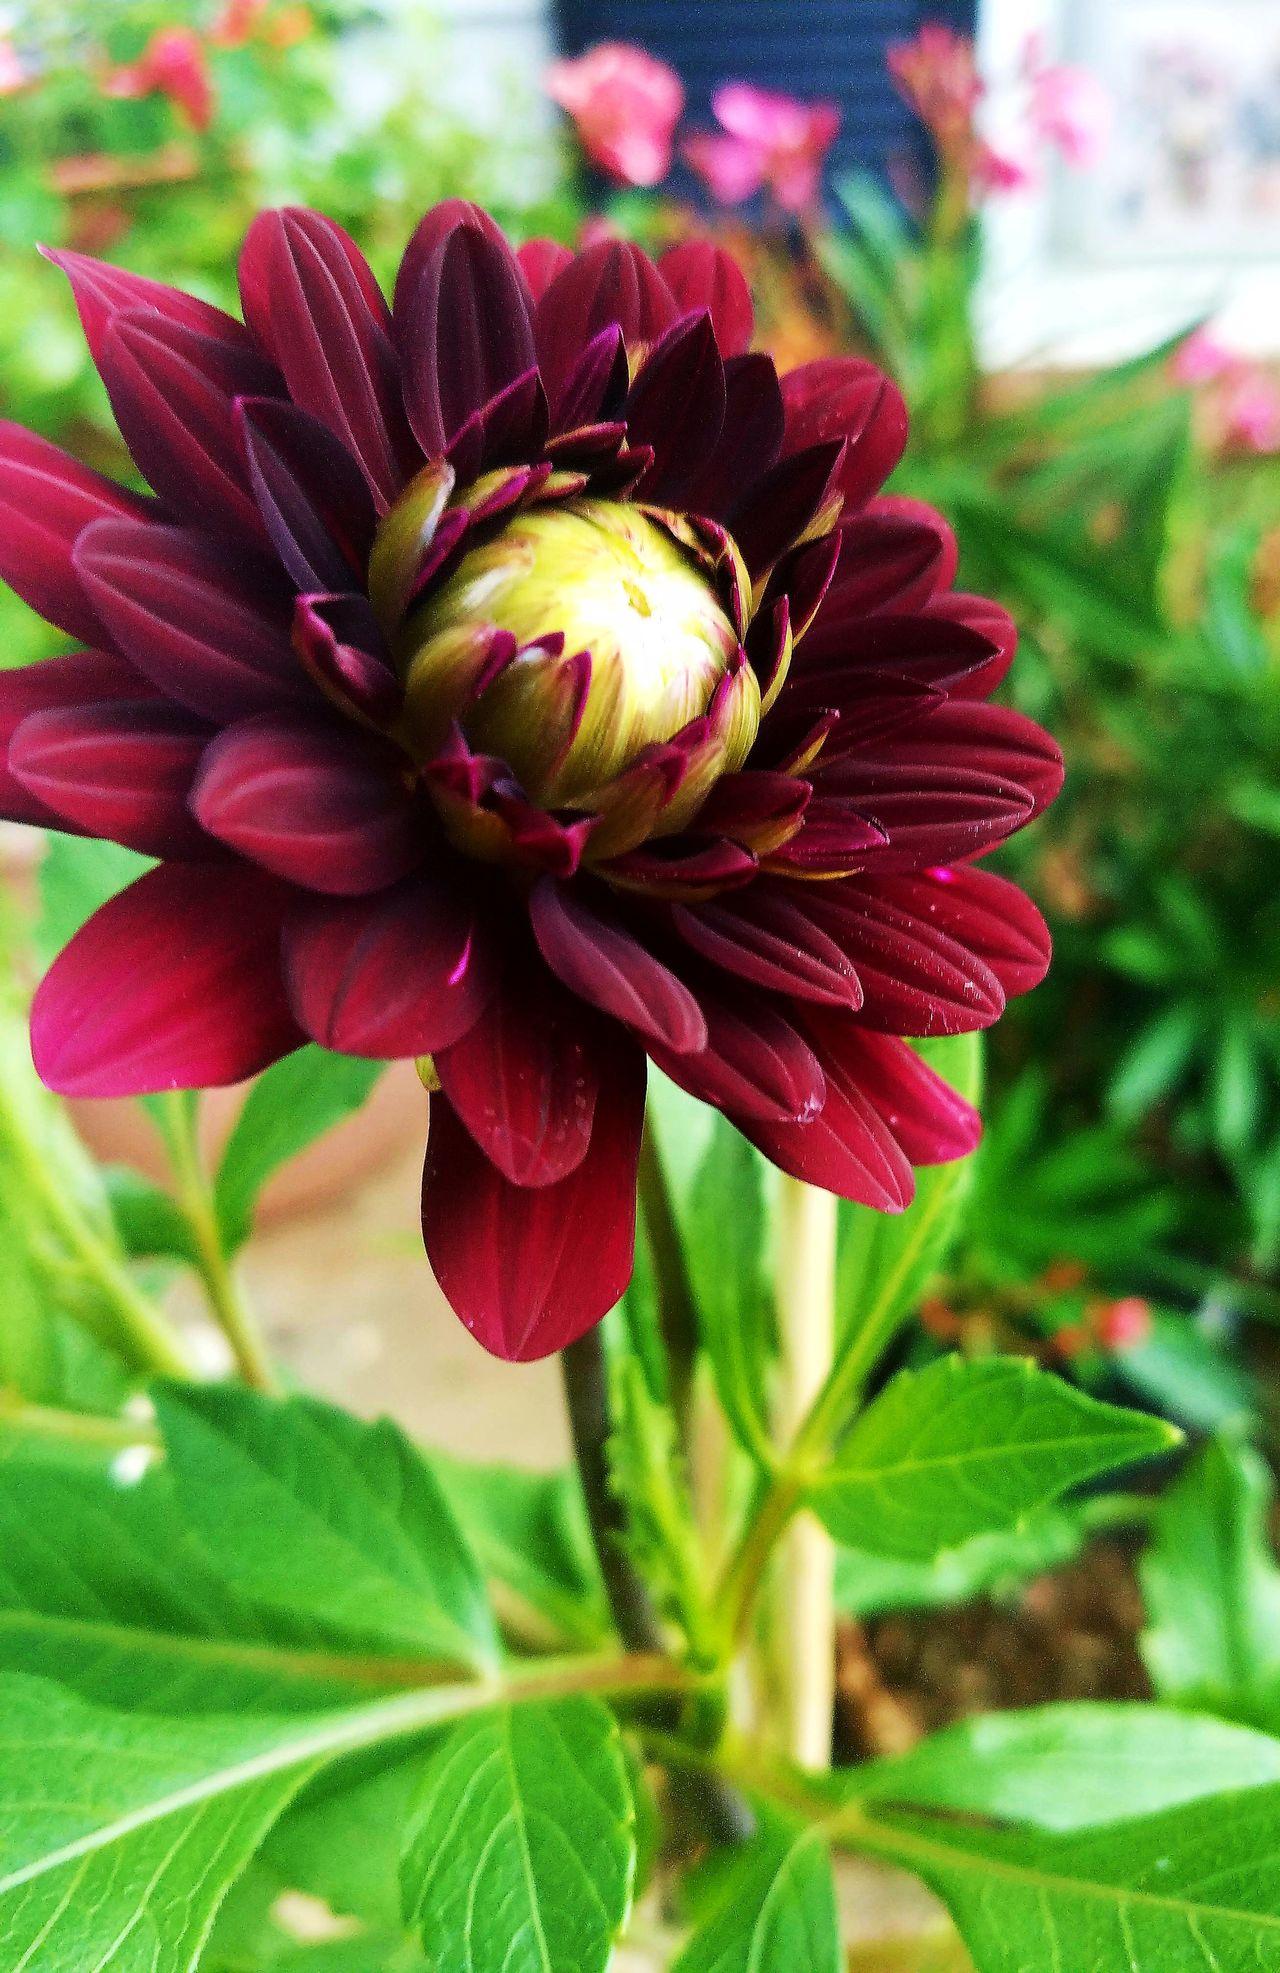 Flower Flower Photography Garden Photography Upclose Flower High Saturation Summer Burgundy Flower Rich Colors Summer Yet To Bloom Samsung Galaxy S7